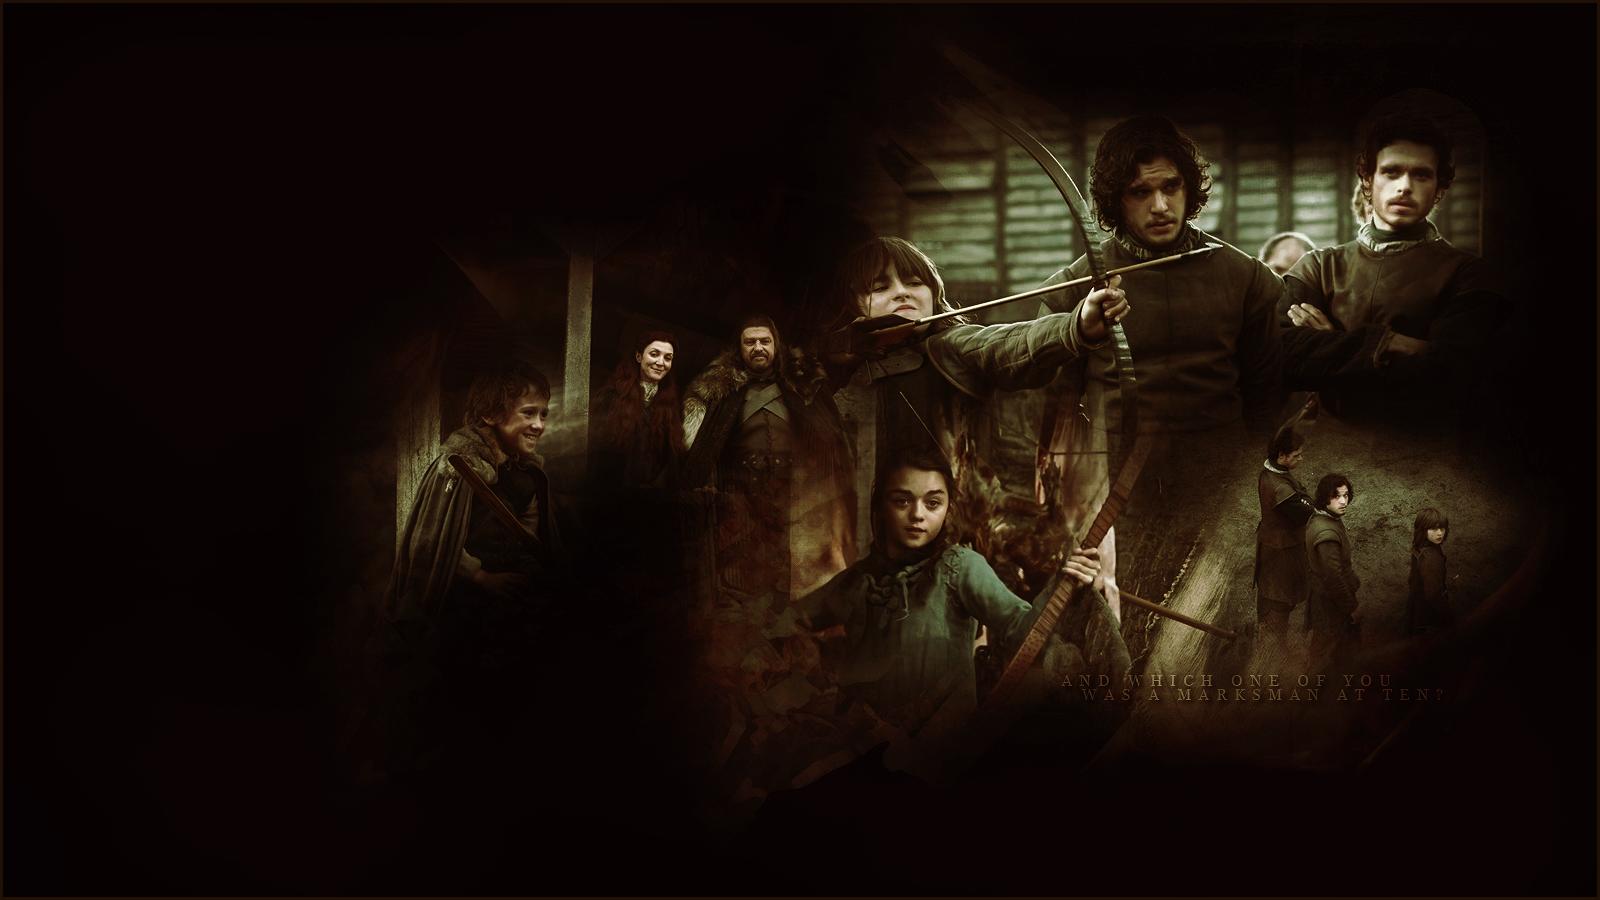 House Stark Game Of Thrones Wallpaper 27629023 Fanpop